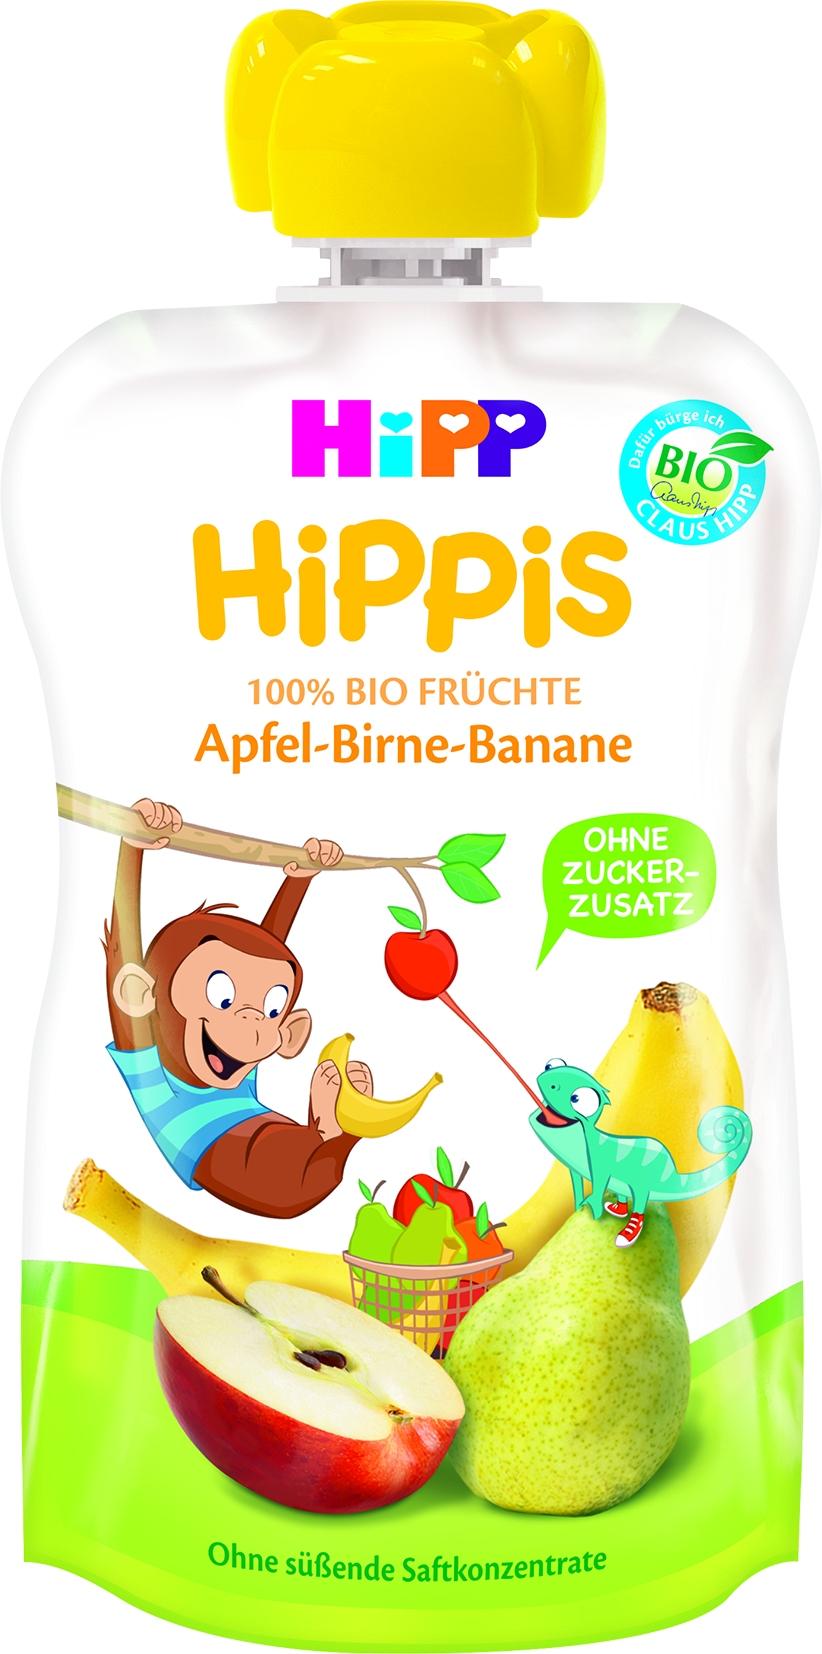 8520-01 Hippis Apfel/Birne/Banane